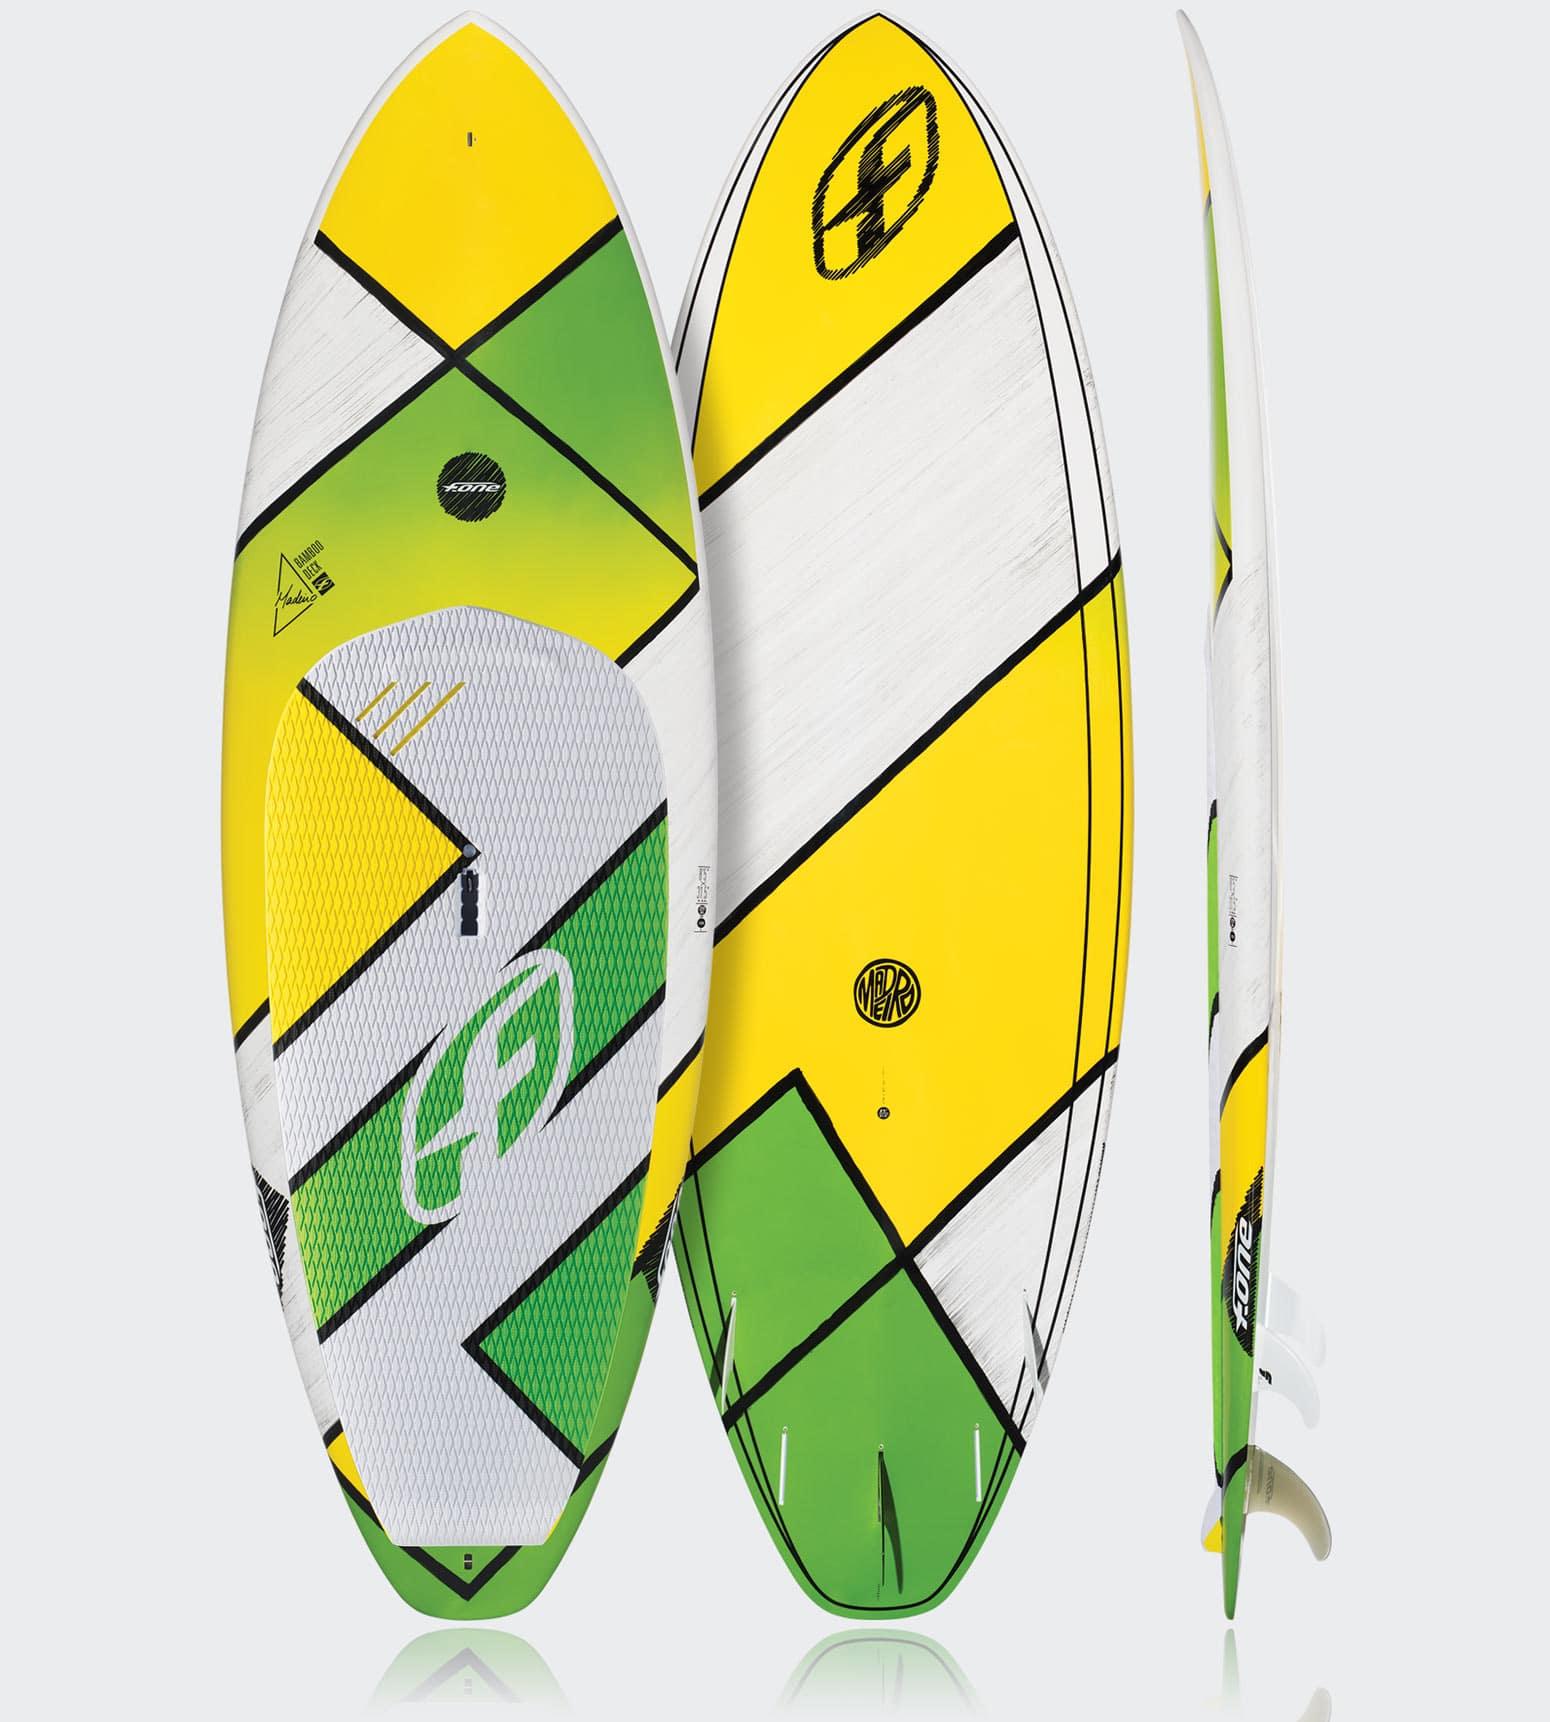 Présentation du stand up paddle surf Madeiro de F-One